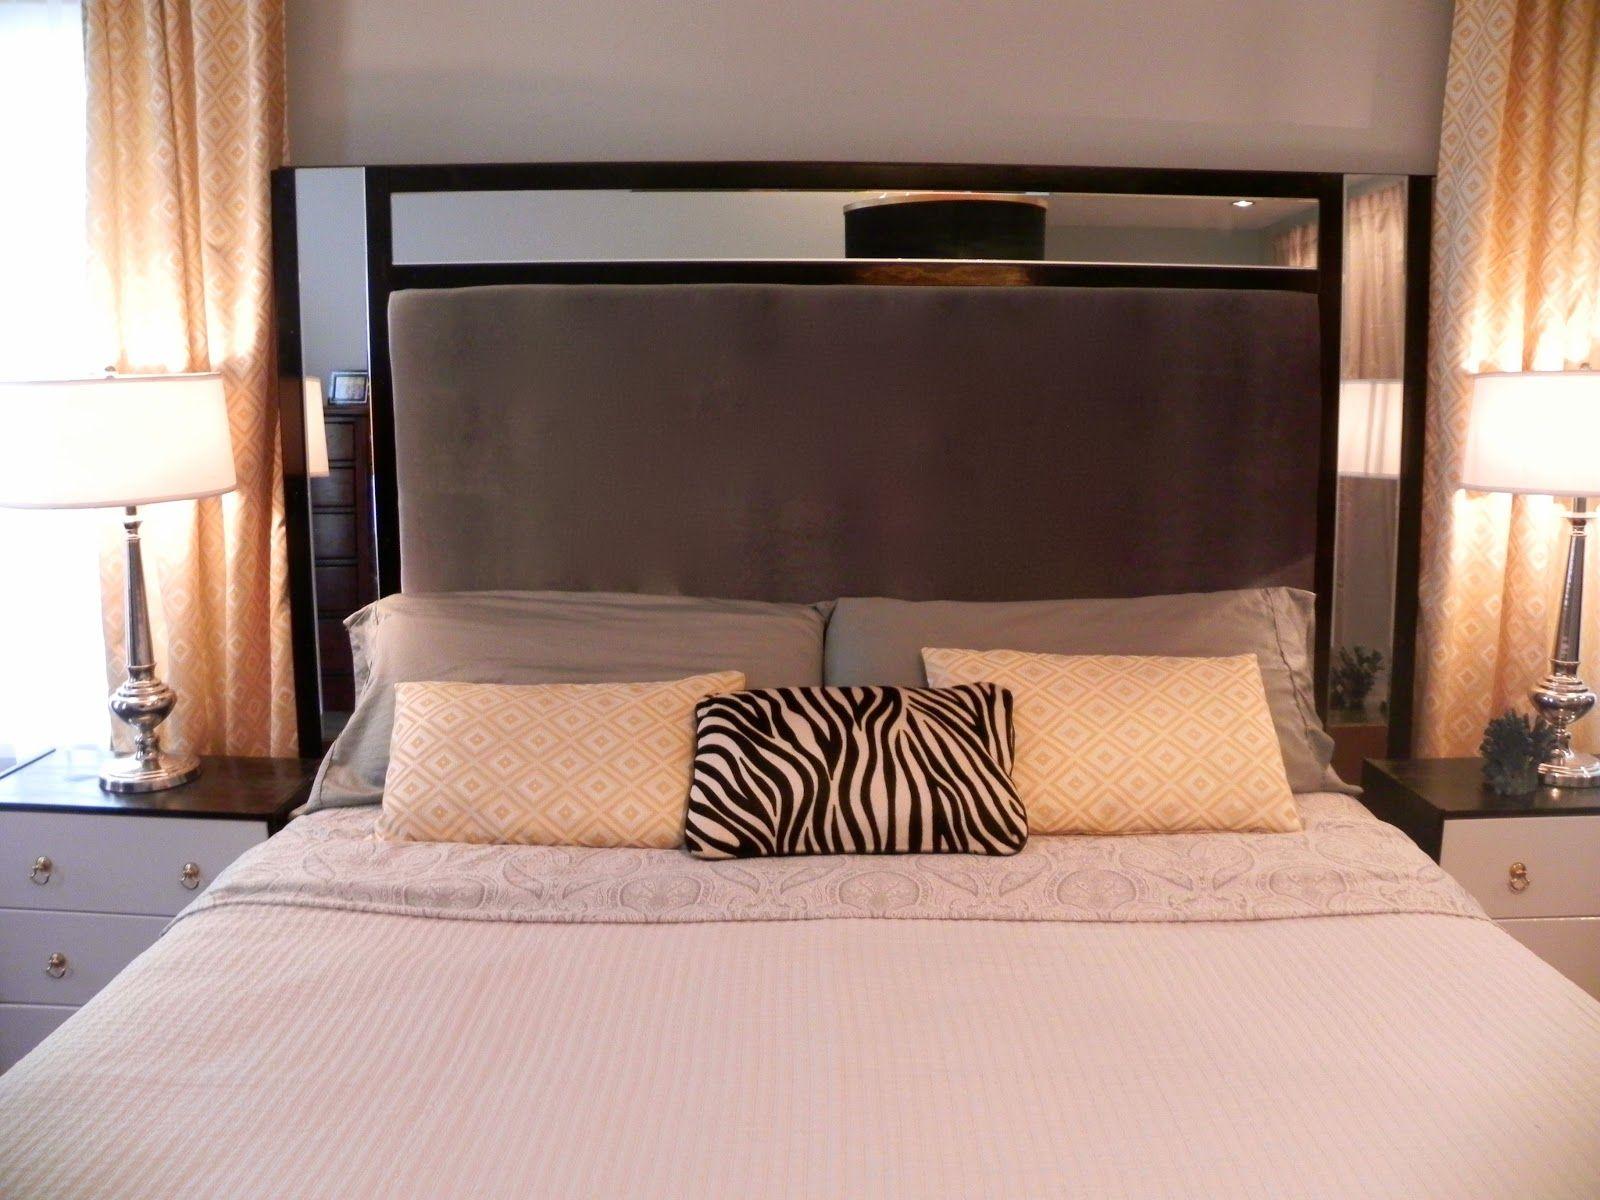 Sheer Serendipity Diy Headboard Upholstered Upholstered Headboard Home Decor